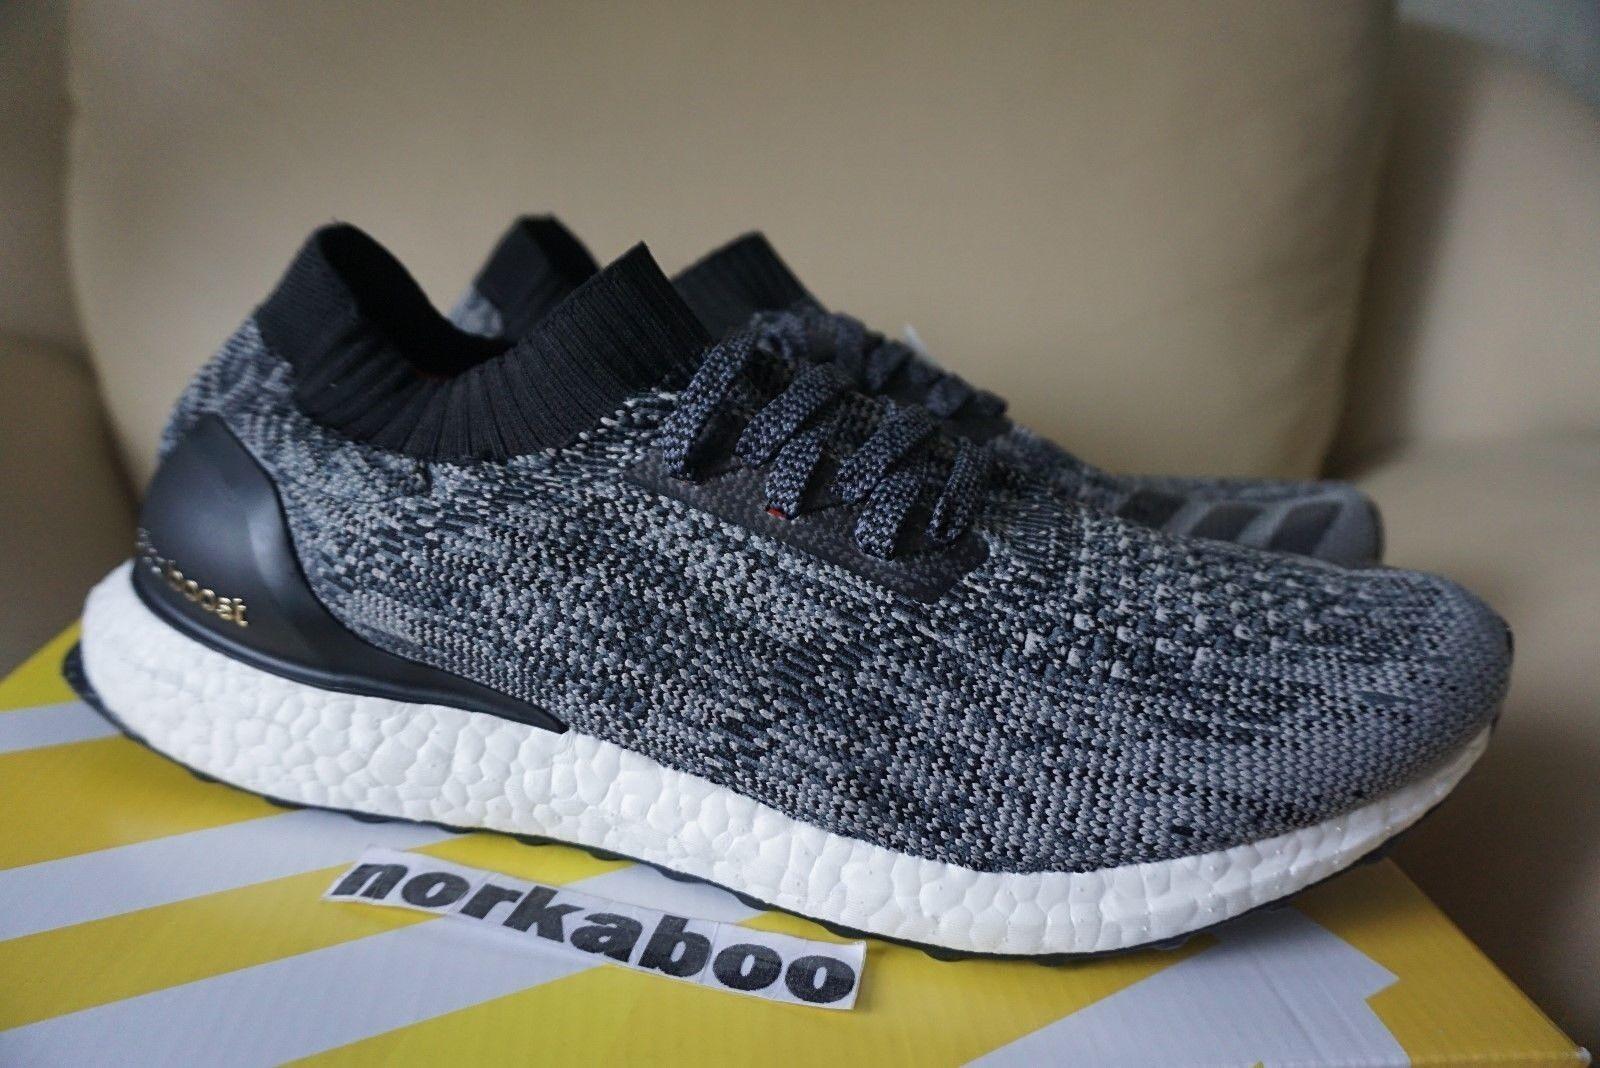 Adidas Boost rare limited running men new BB3900 White Black